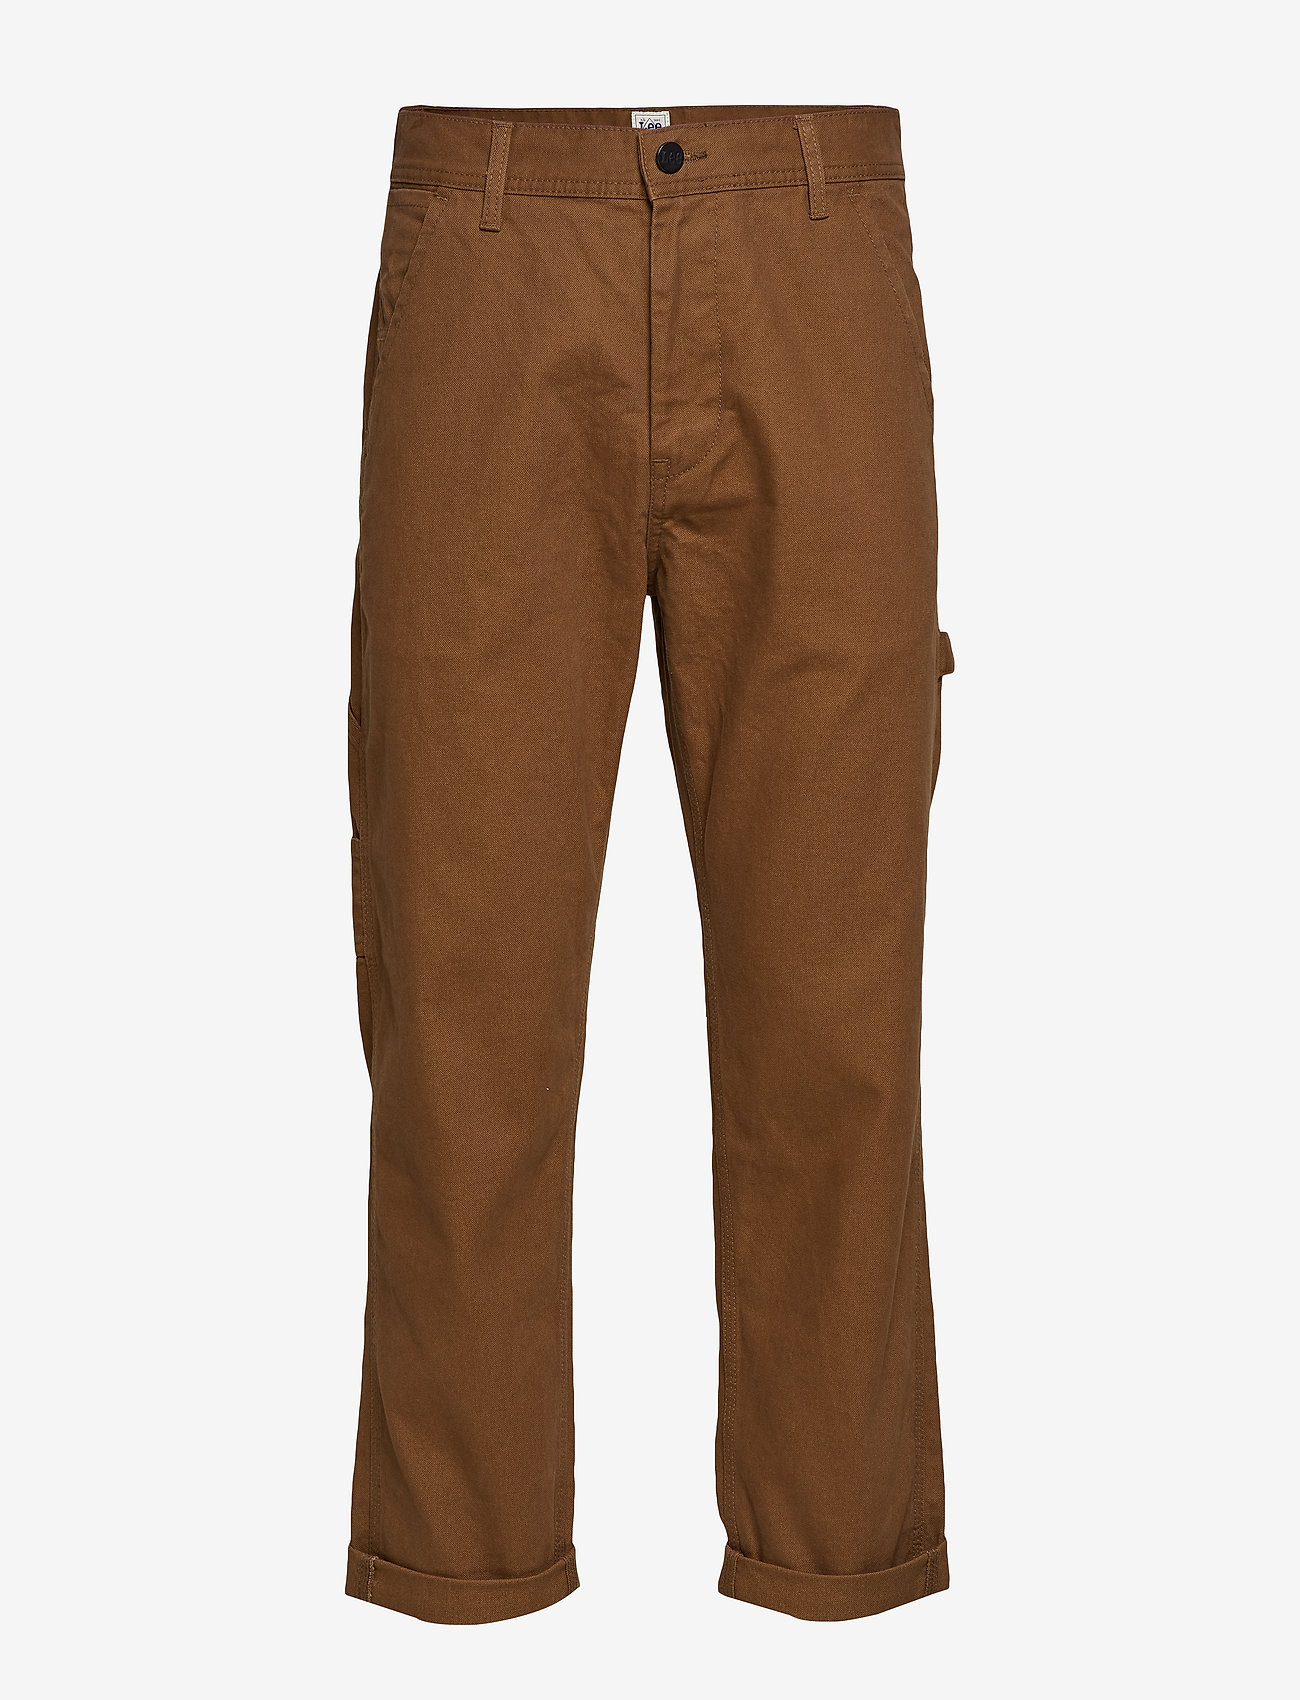 Lee Jeans - CARPENTER - bojówki - toffee - 0